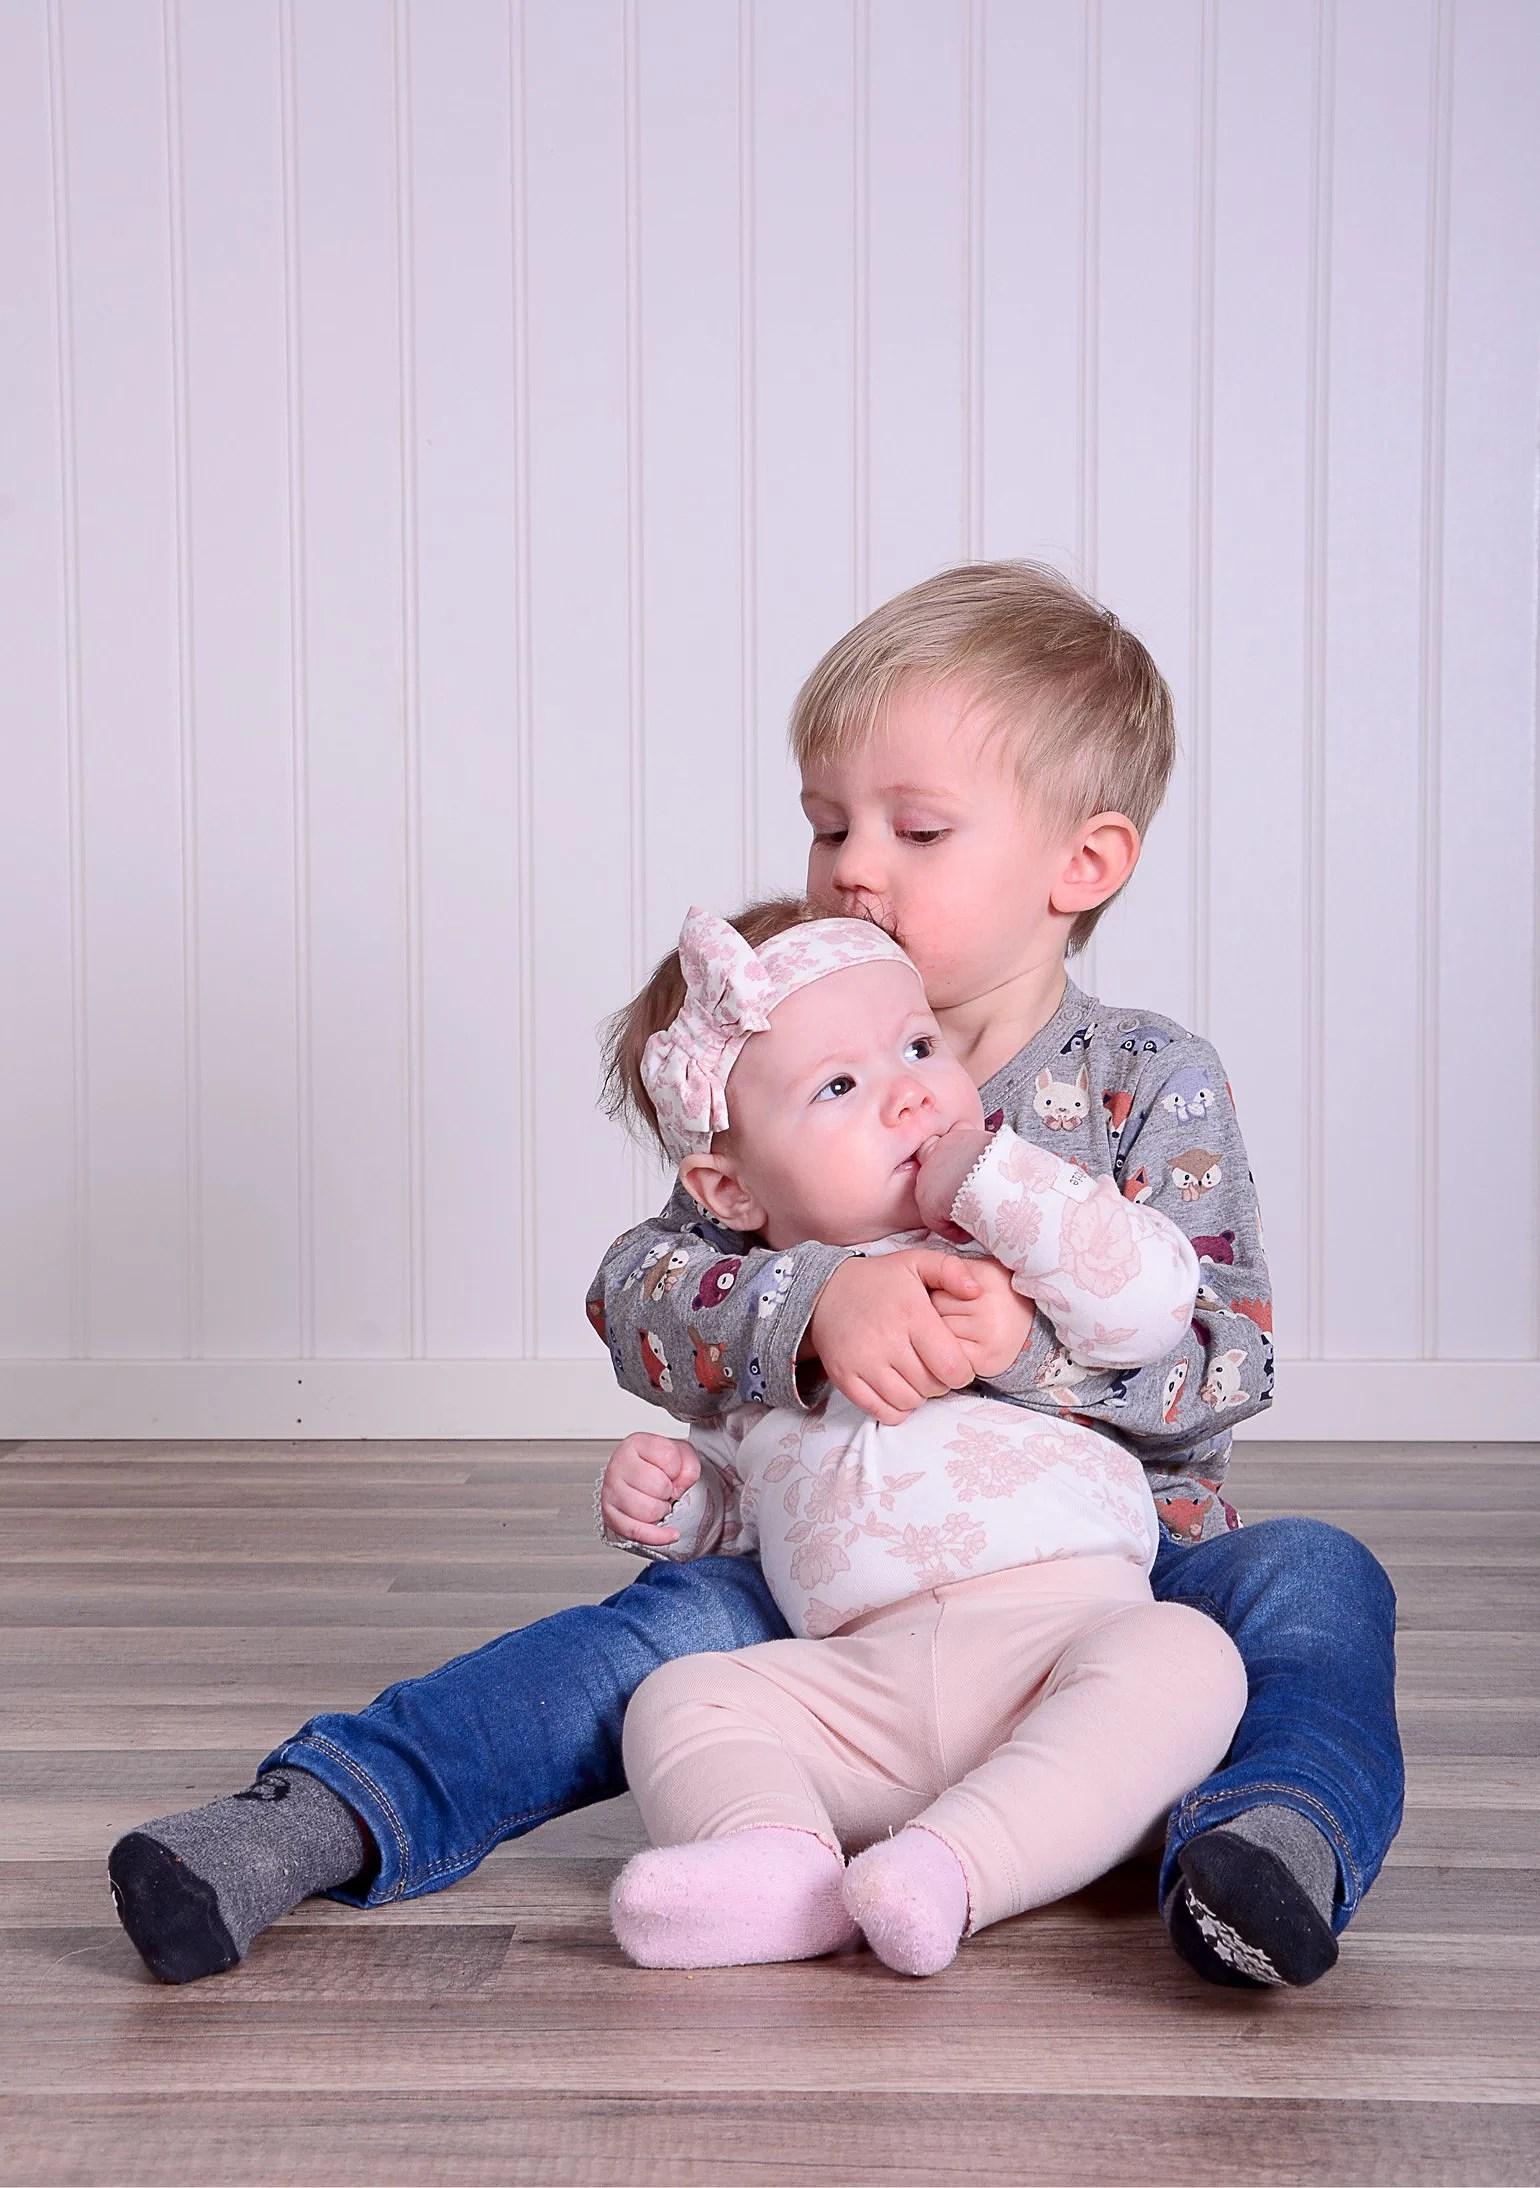 Jäkla vaccin..